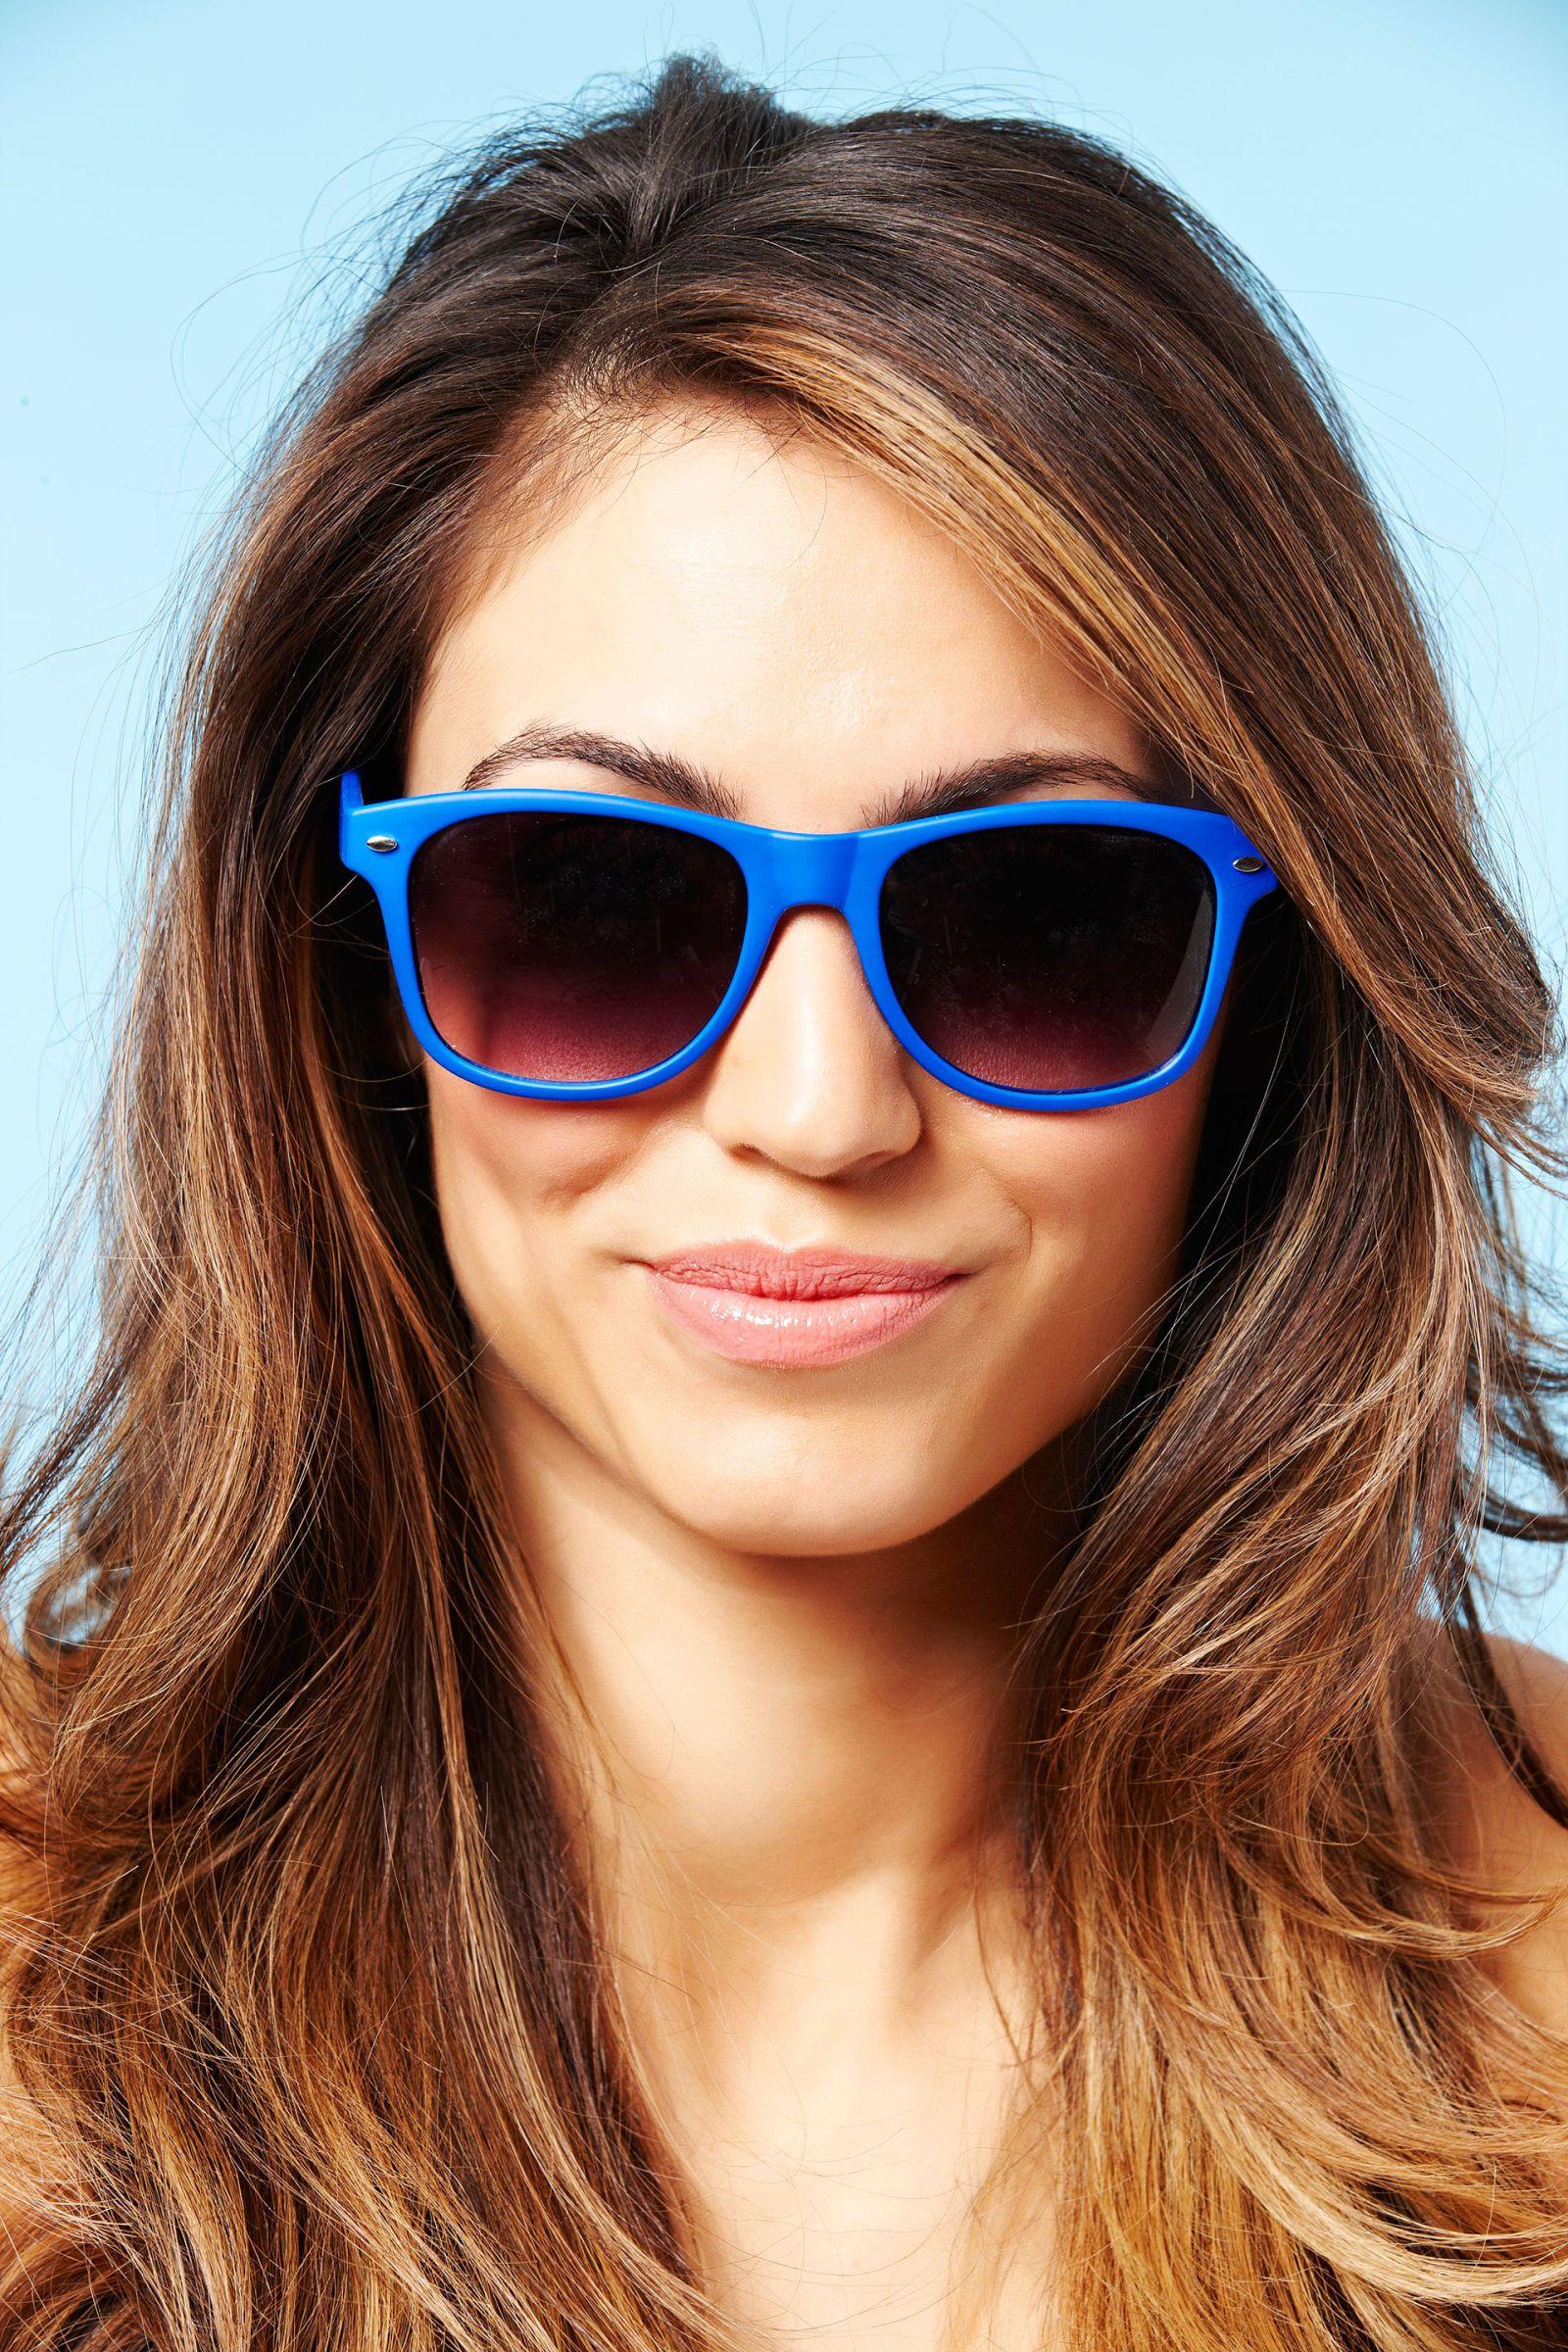 sunglasses and lipstick trend